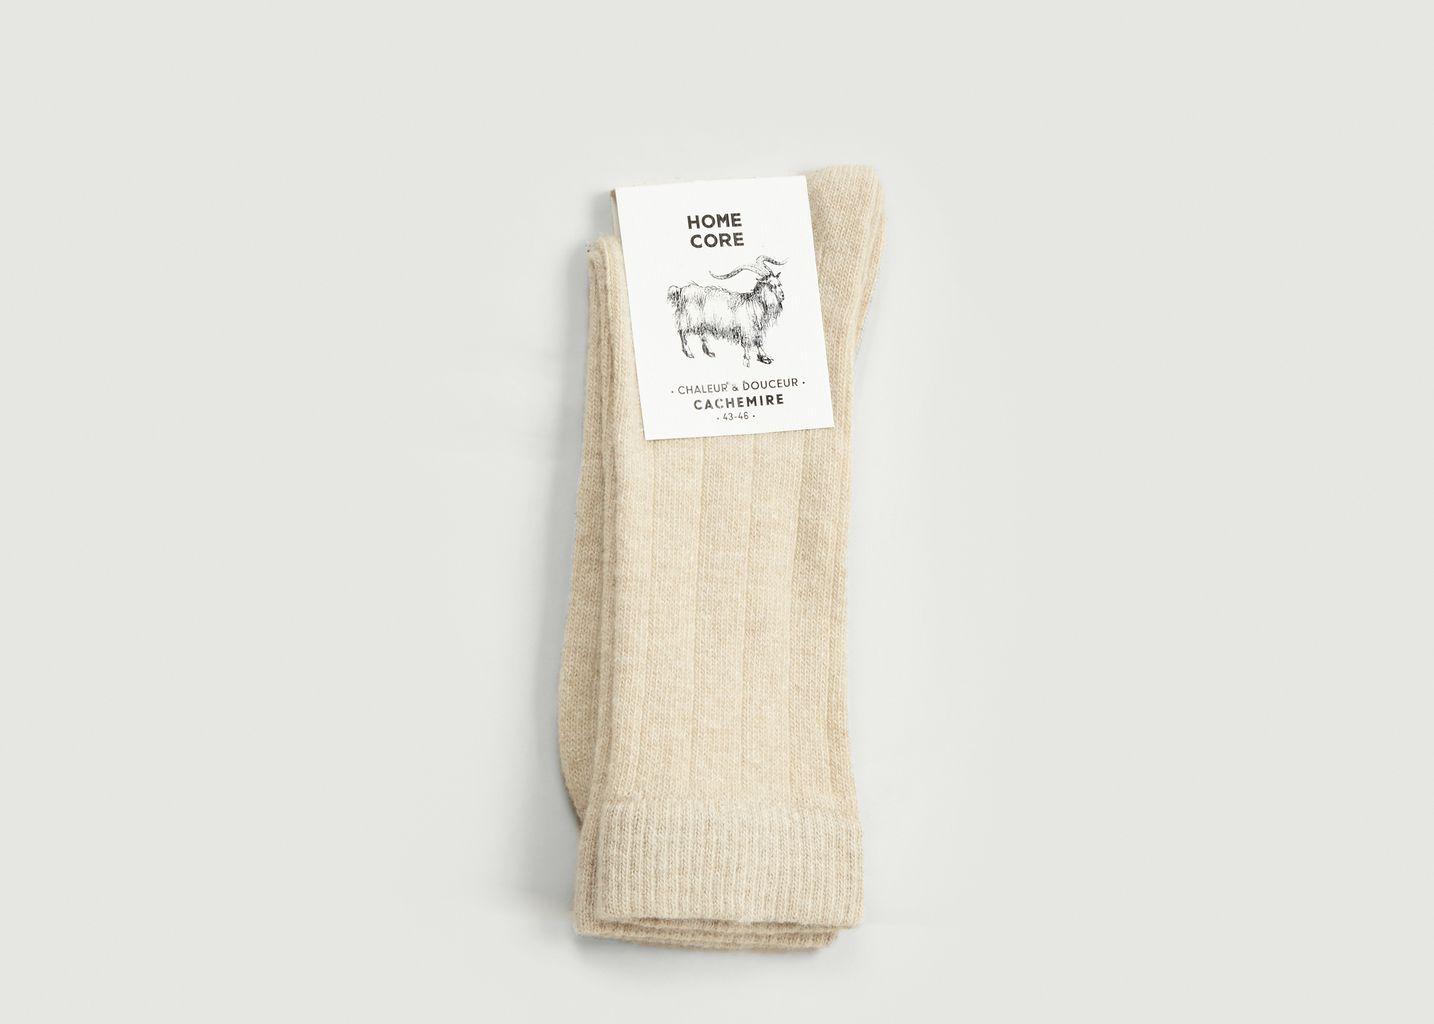 Chaussettes cachemire  - Homecore